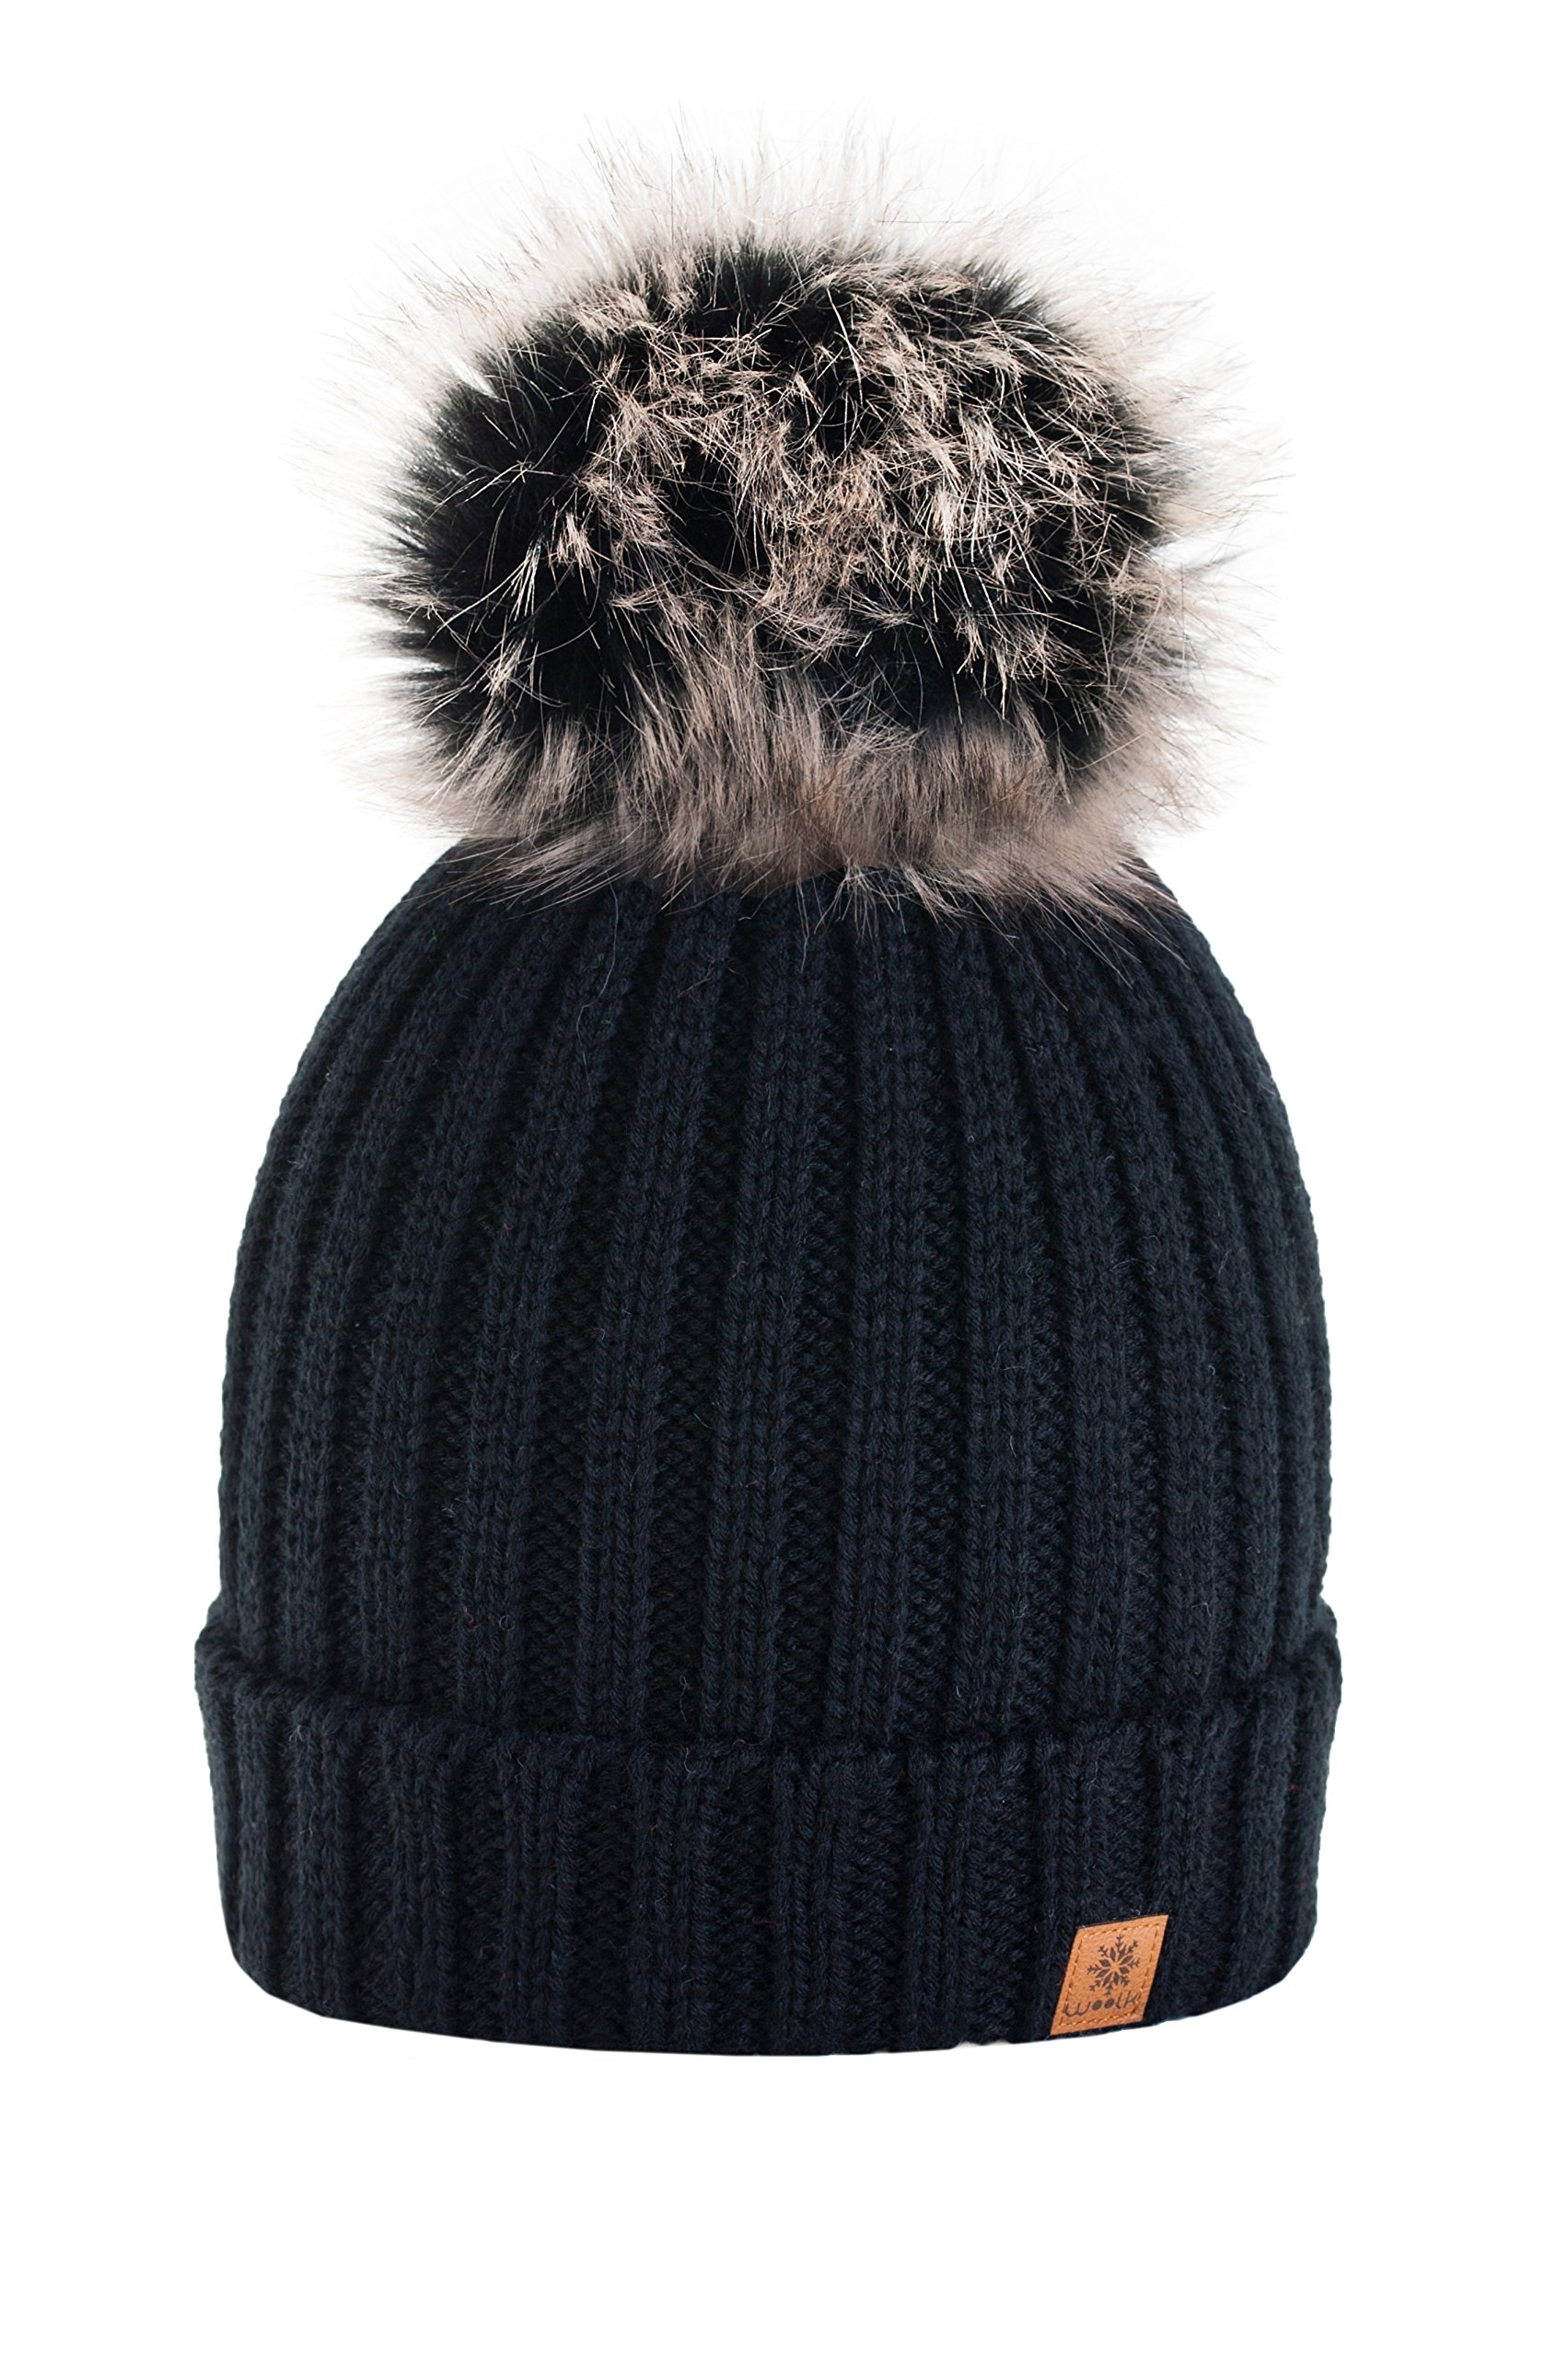 278eeef1970 4sold Rita Womens Girls Winter Hat Wool Knitted Beanie with Large Pom Pom  Cap SKI Snowboard